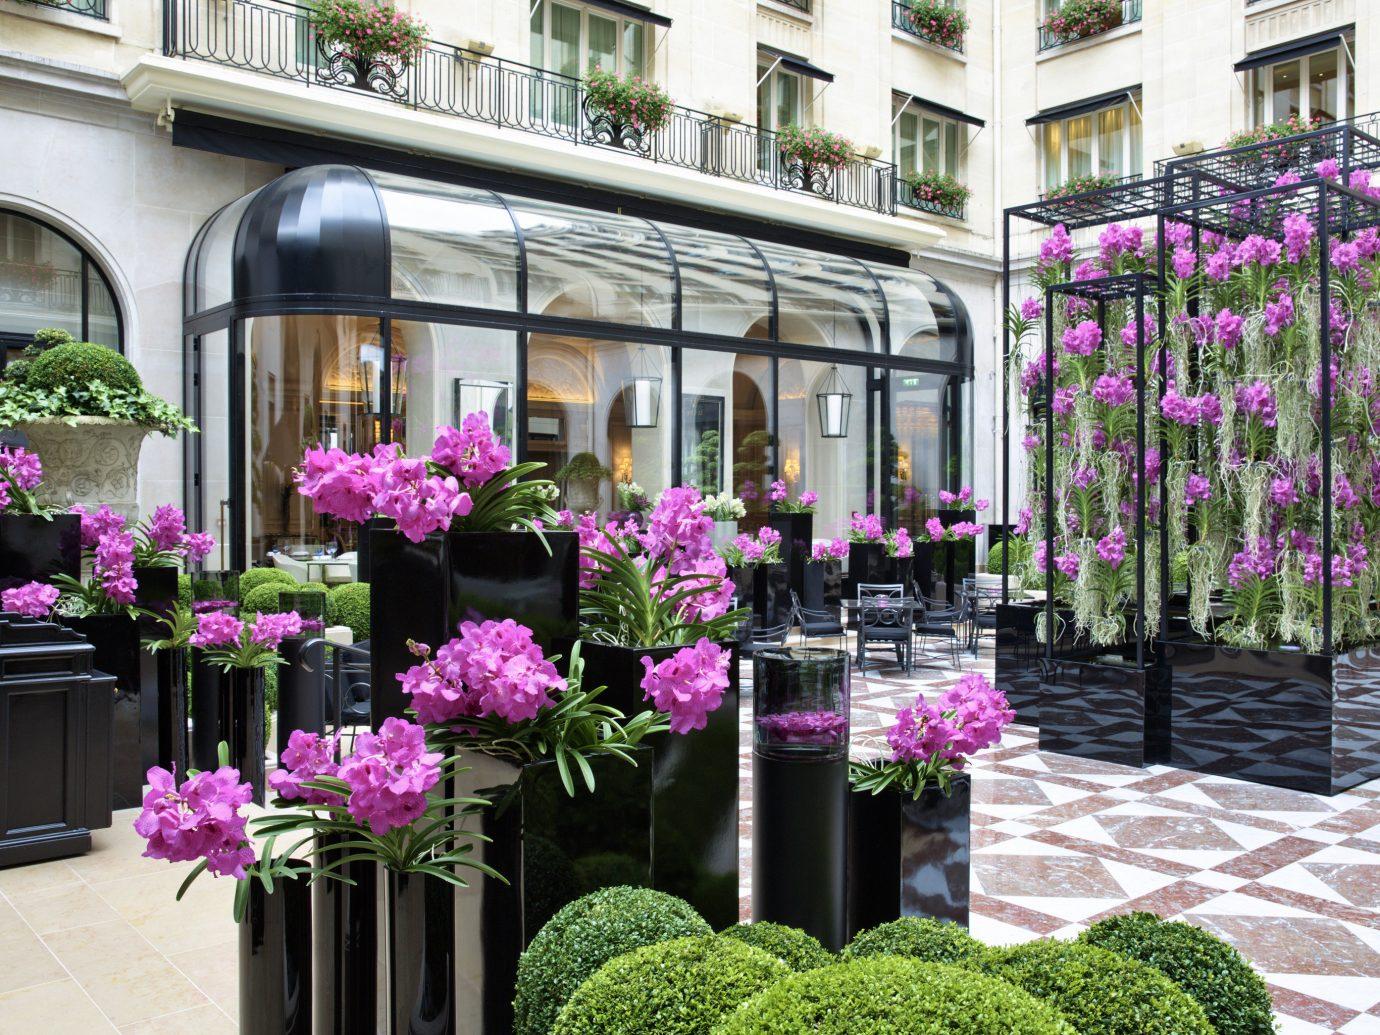 Hotels outdoor flower arranging pink floristry flower aisle purple flora plant Balcony floral design Courtyard estate Garden retail decorated